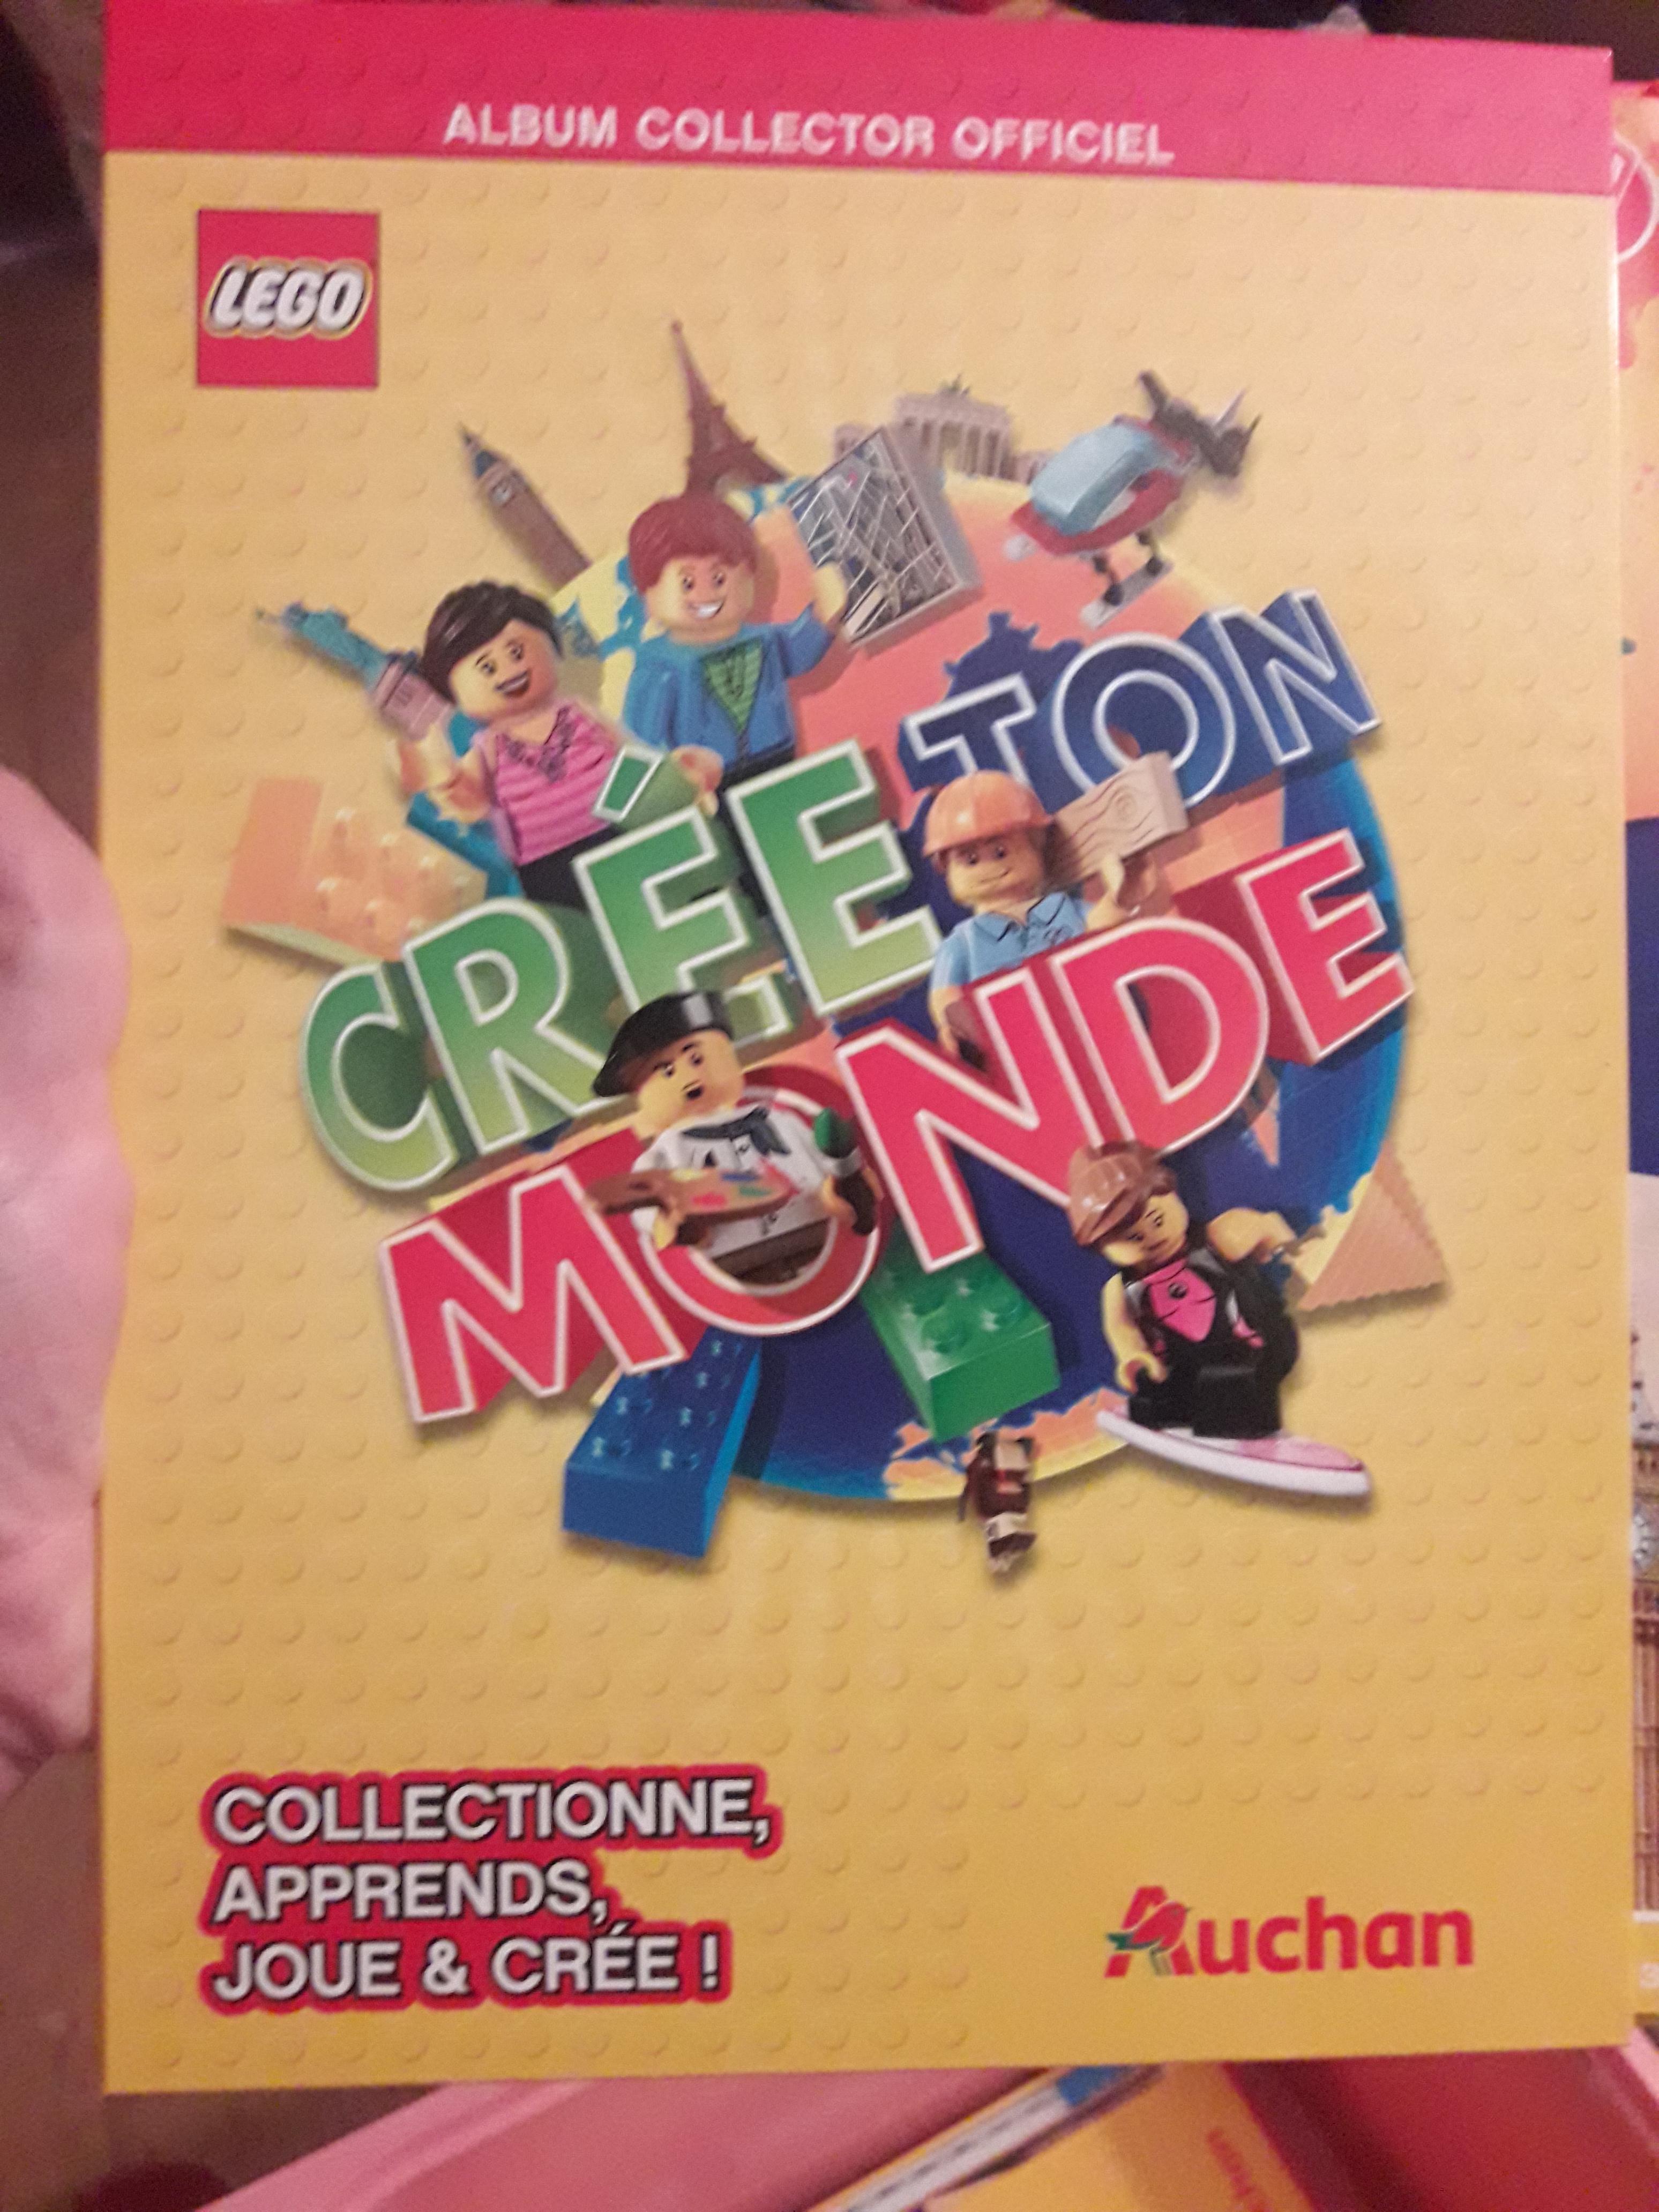 troc de troc album lego neuf image 0